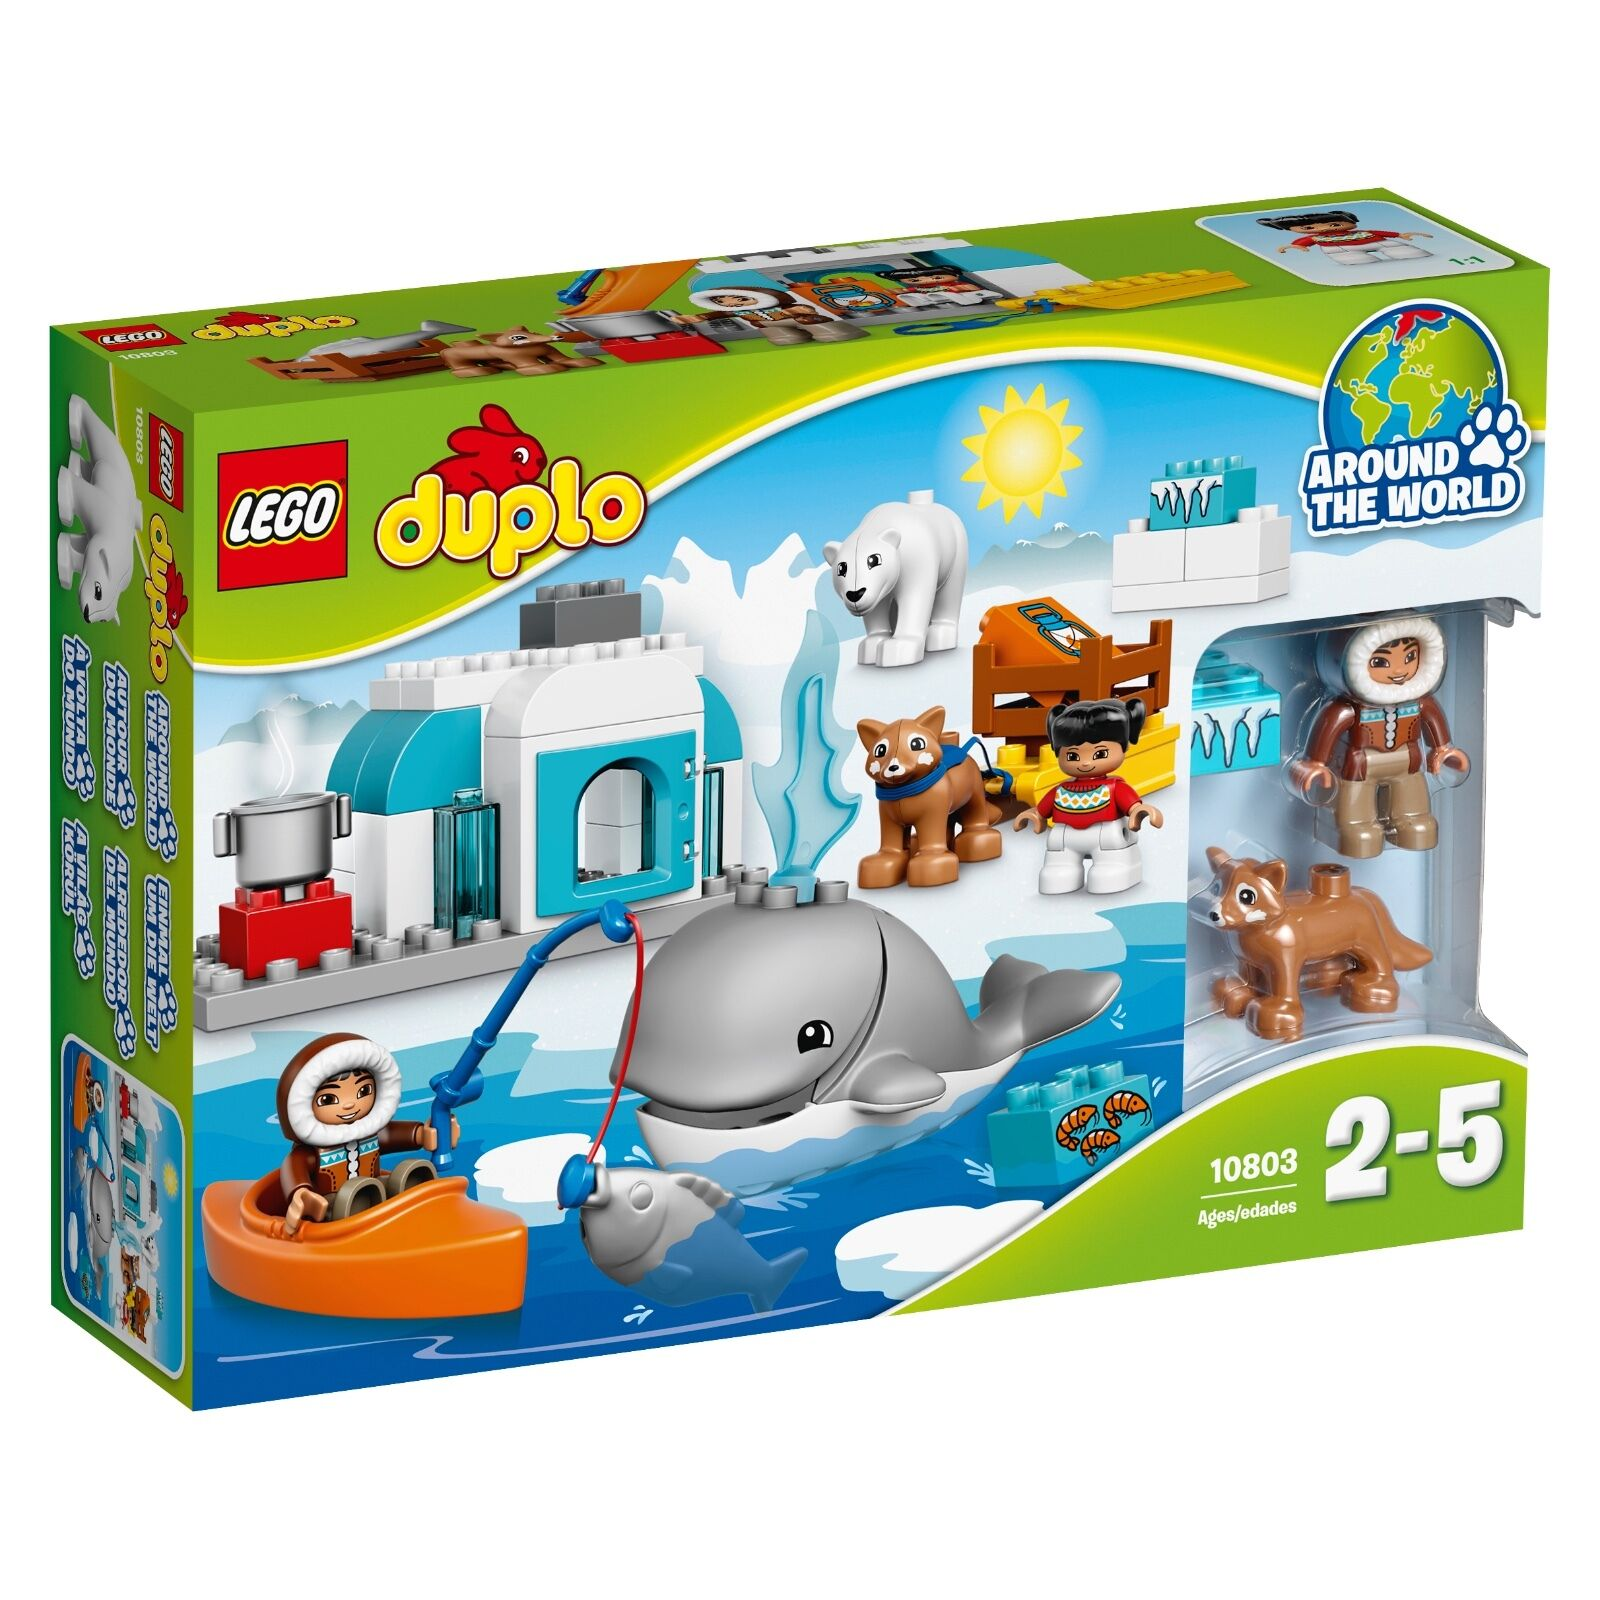 Lego ® duplo ® 10803 ártico nuevo embalaje original _ Arctic New misb NRFB